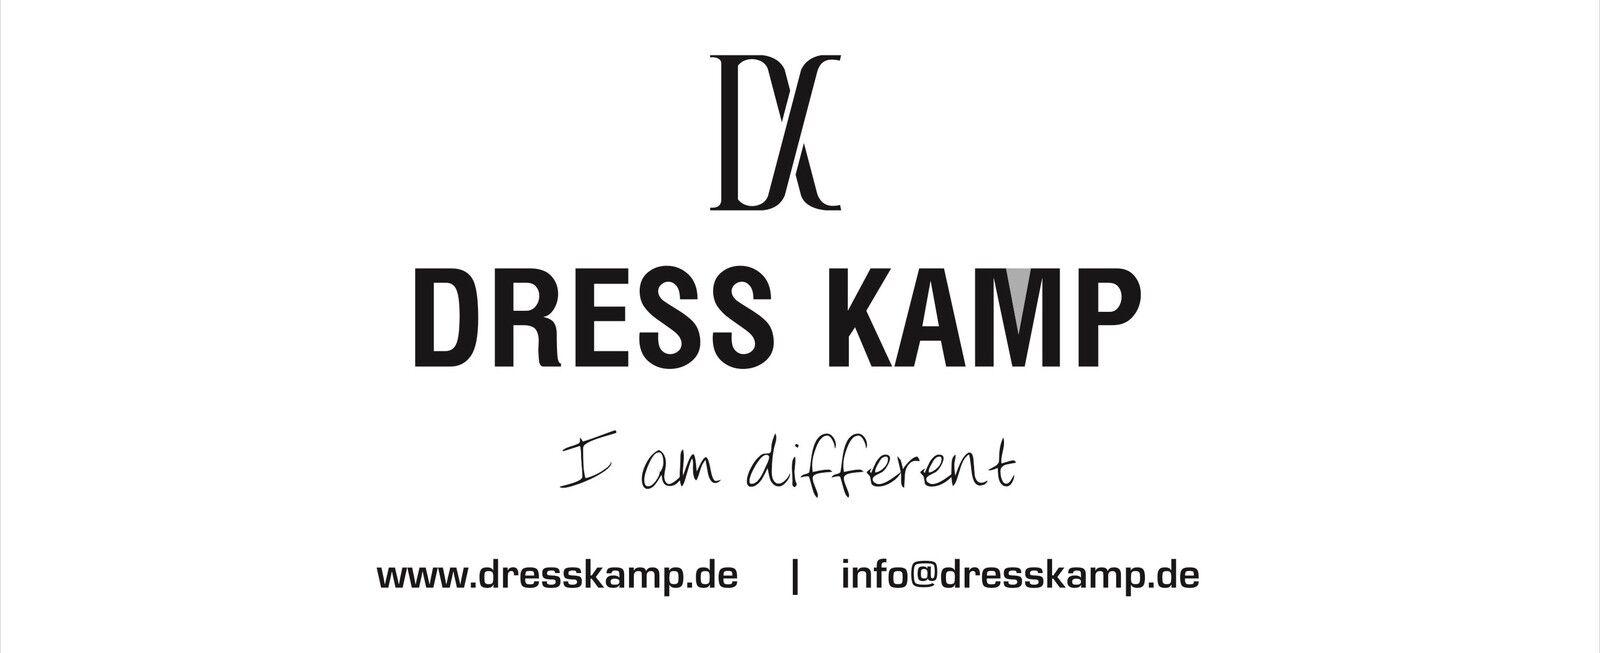 DressKamp